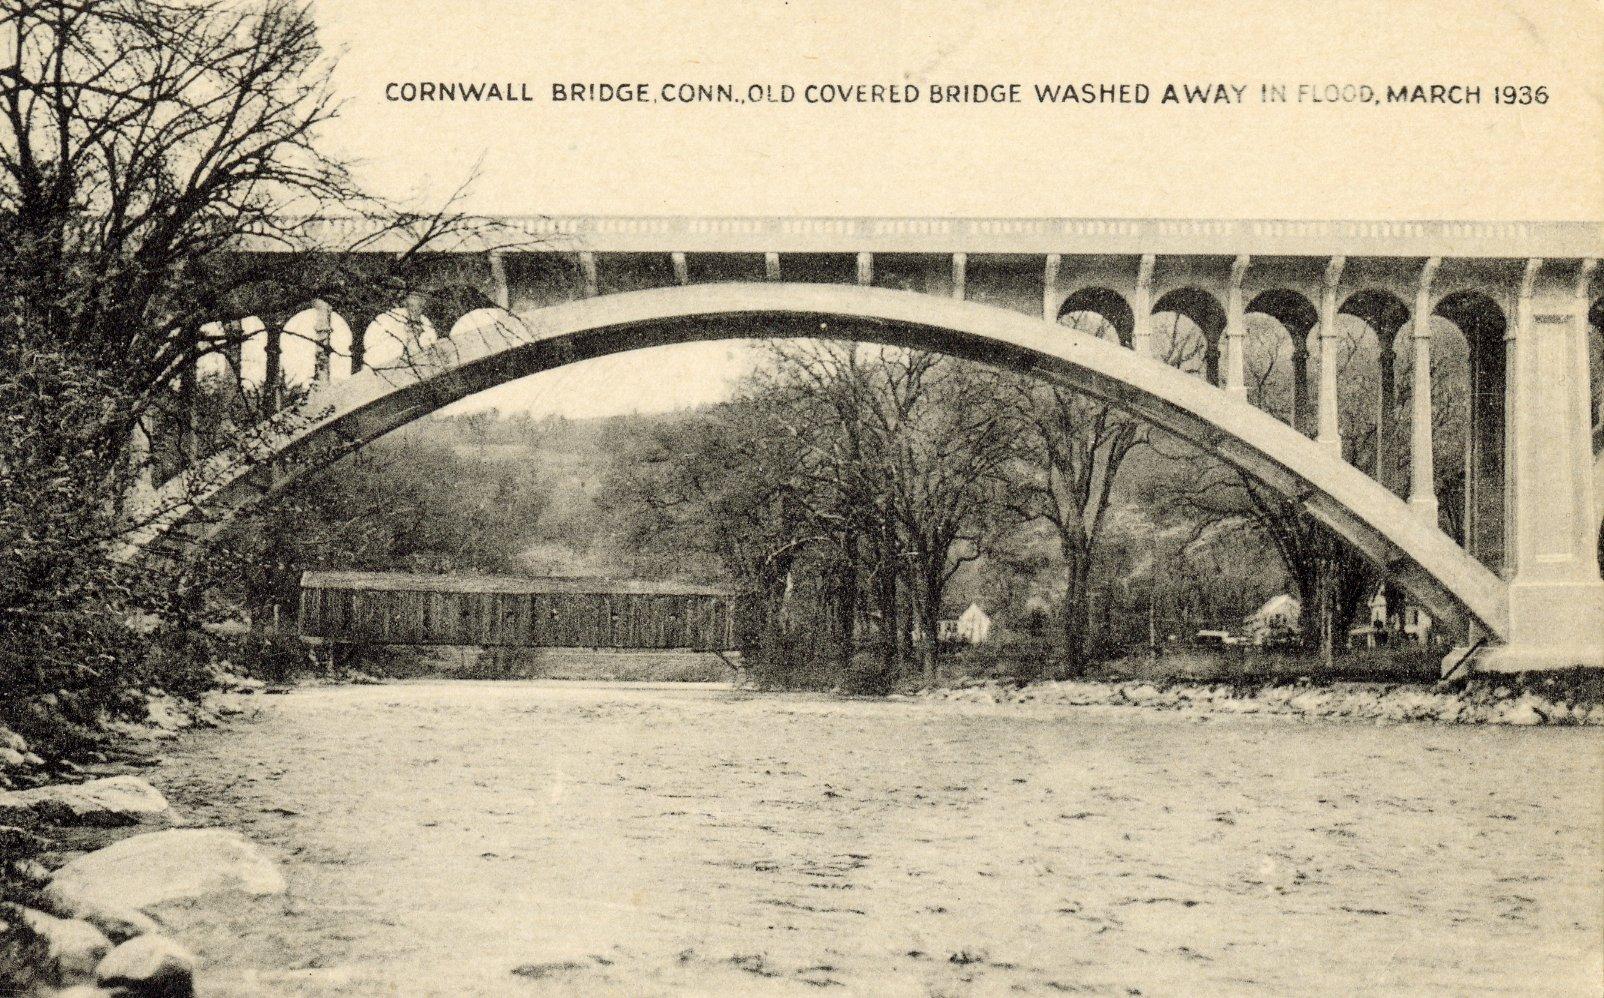 Cornwall Bridge, Connecticut